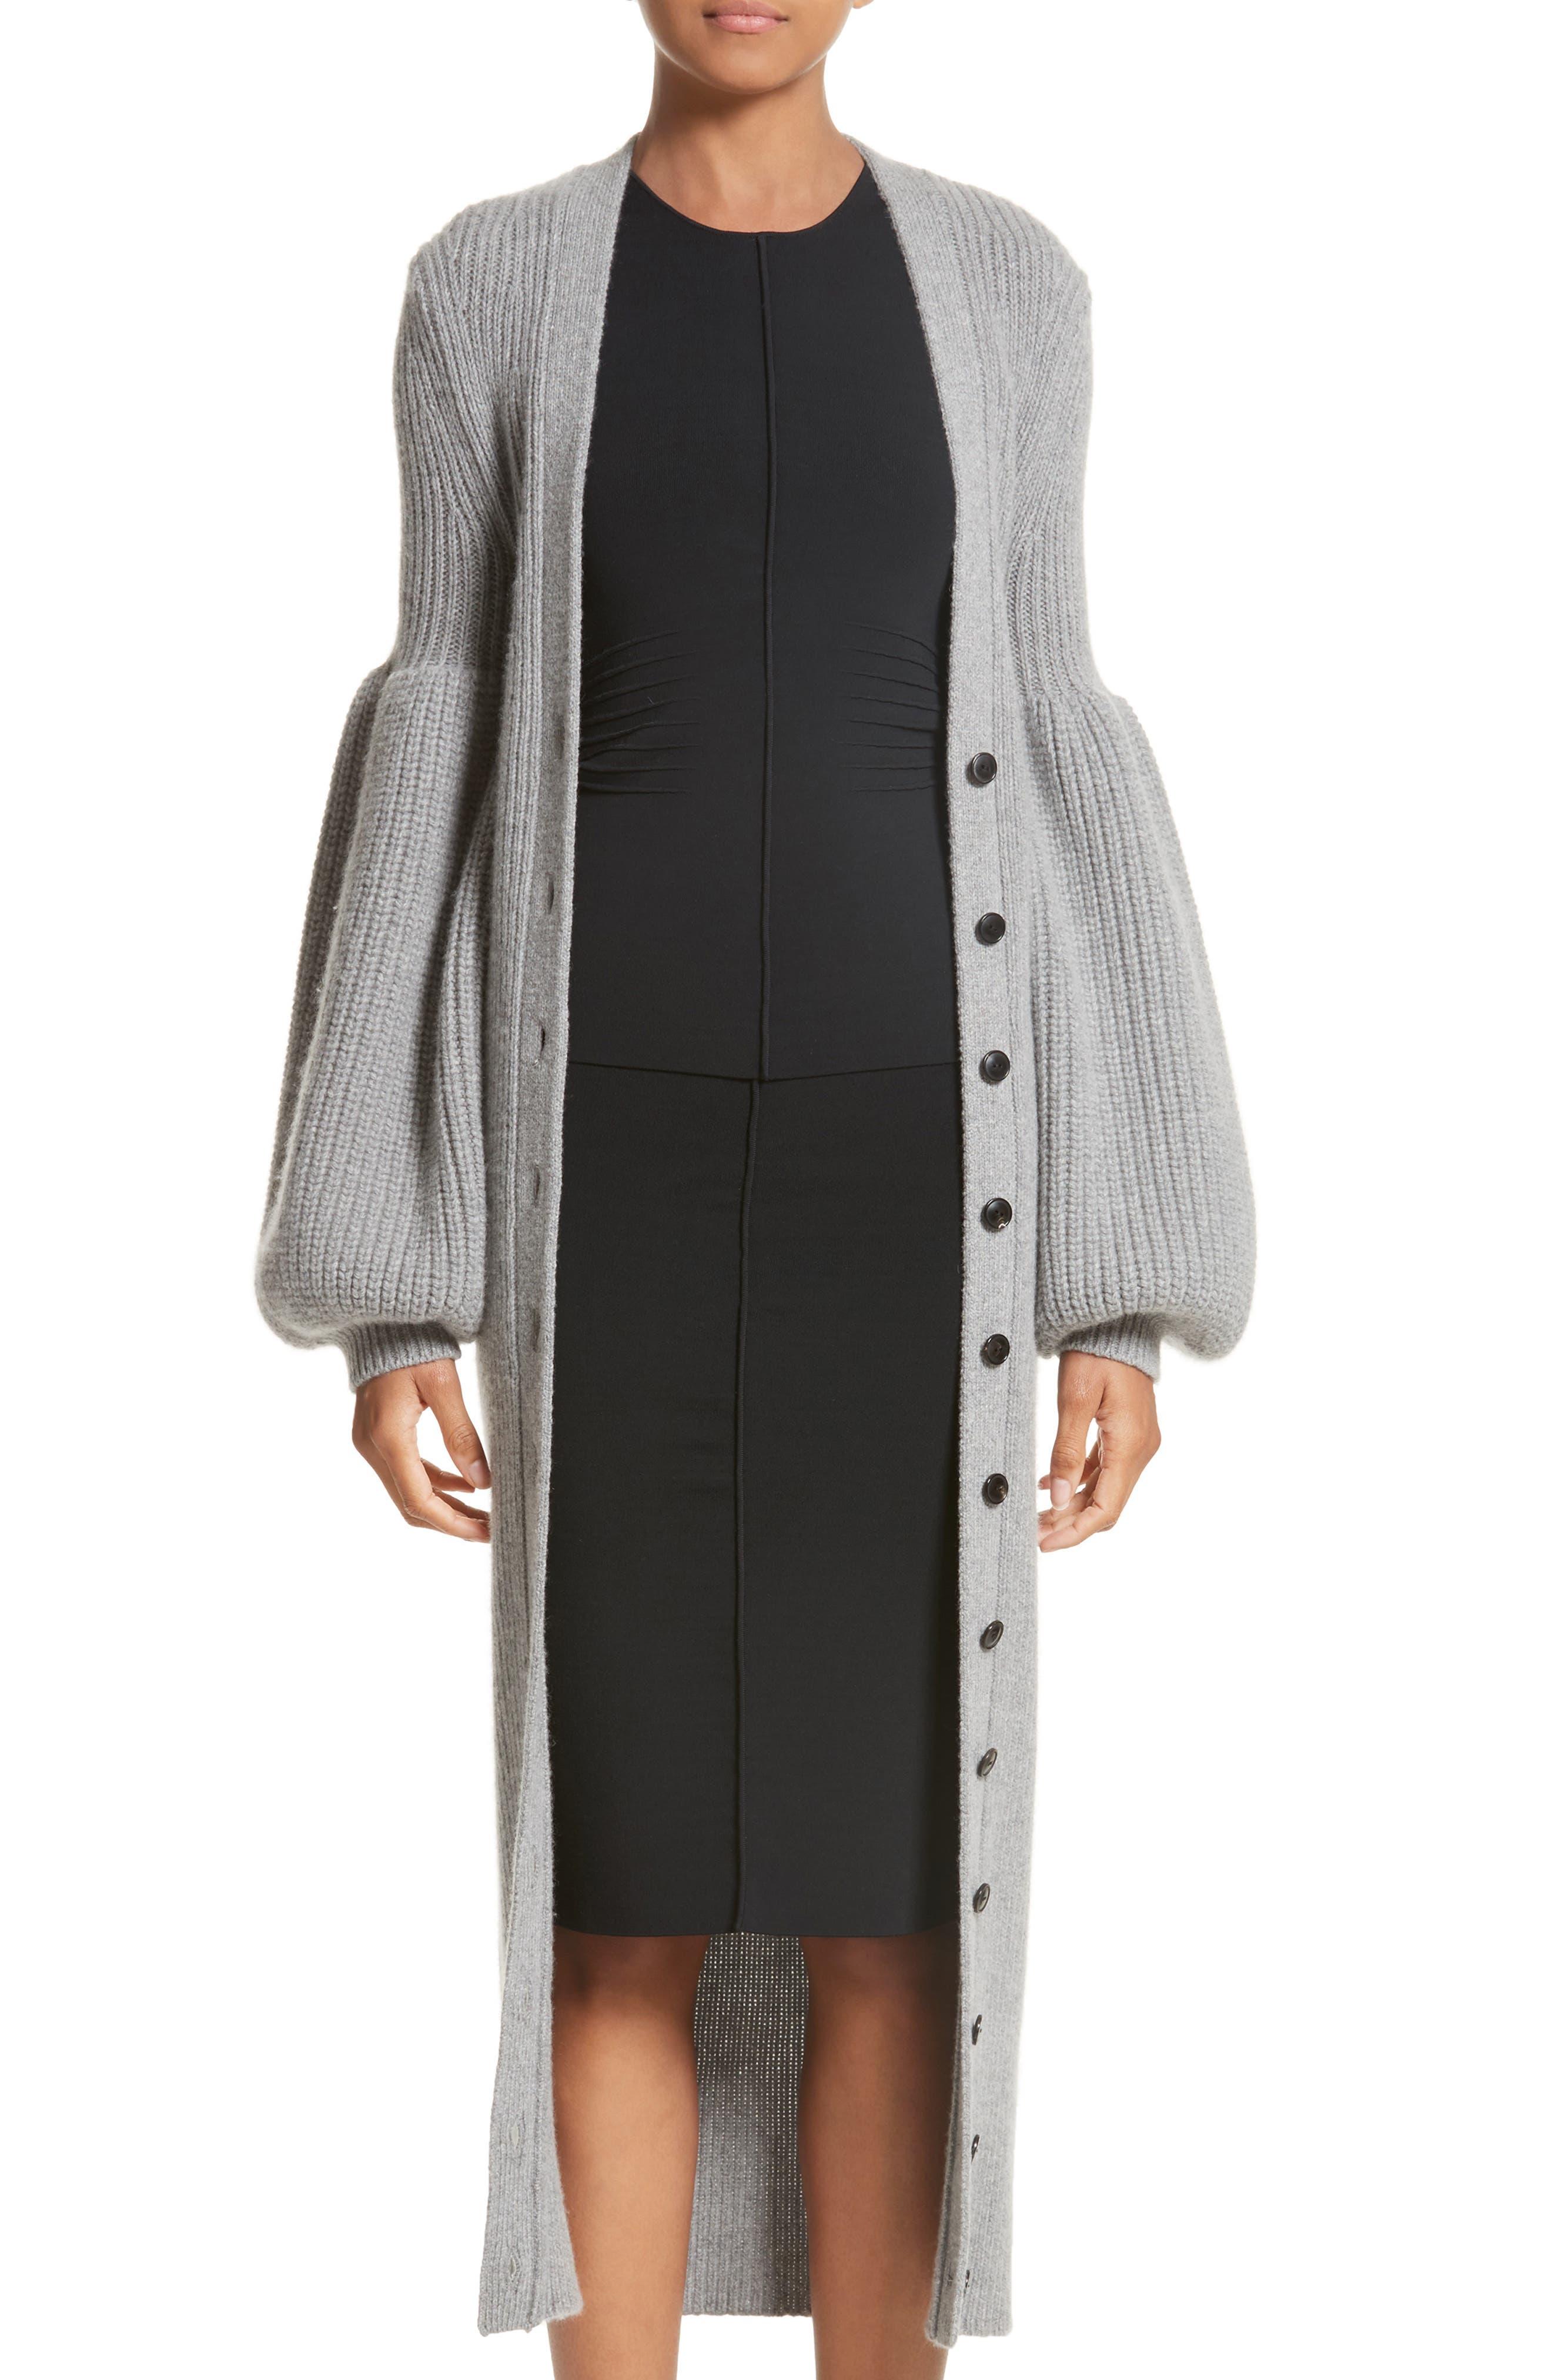 Bishop Sleeve Cardigan,                             Main thumbnail 1, color,                             Grey Melange